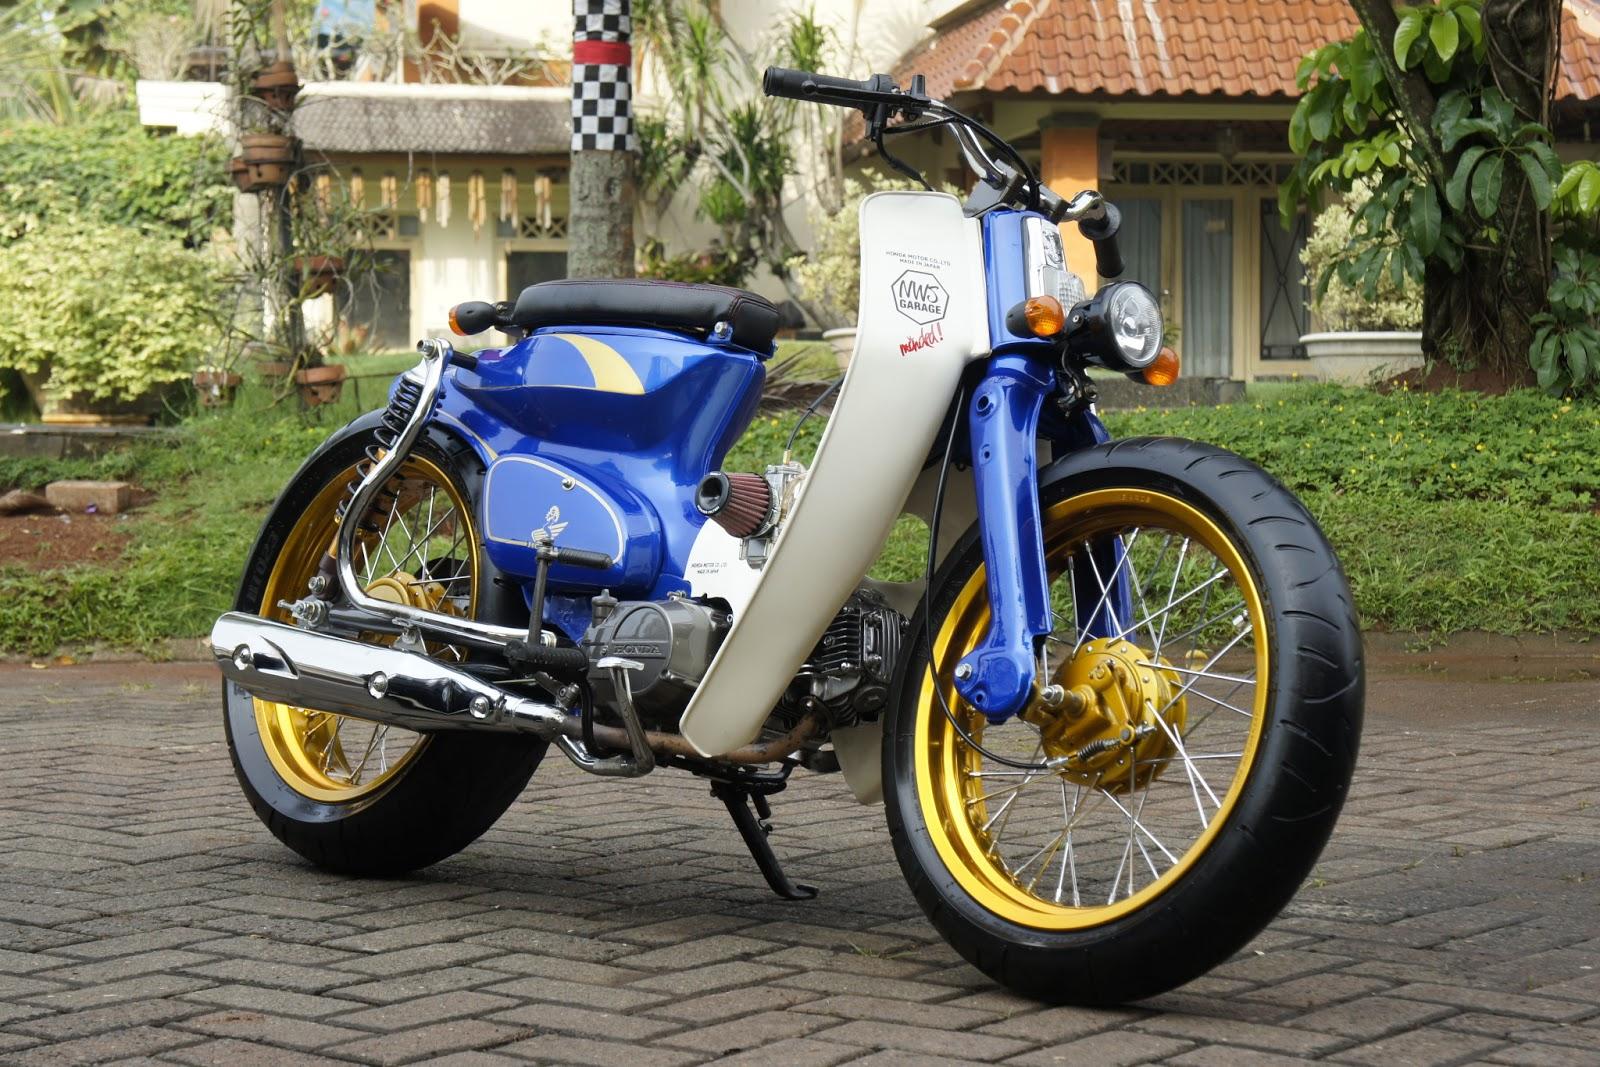 cool indonesian honda c90 motorcycle news forum mcn. Black Bedroom Furniture Sets. Home Design Ideas